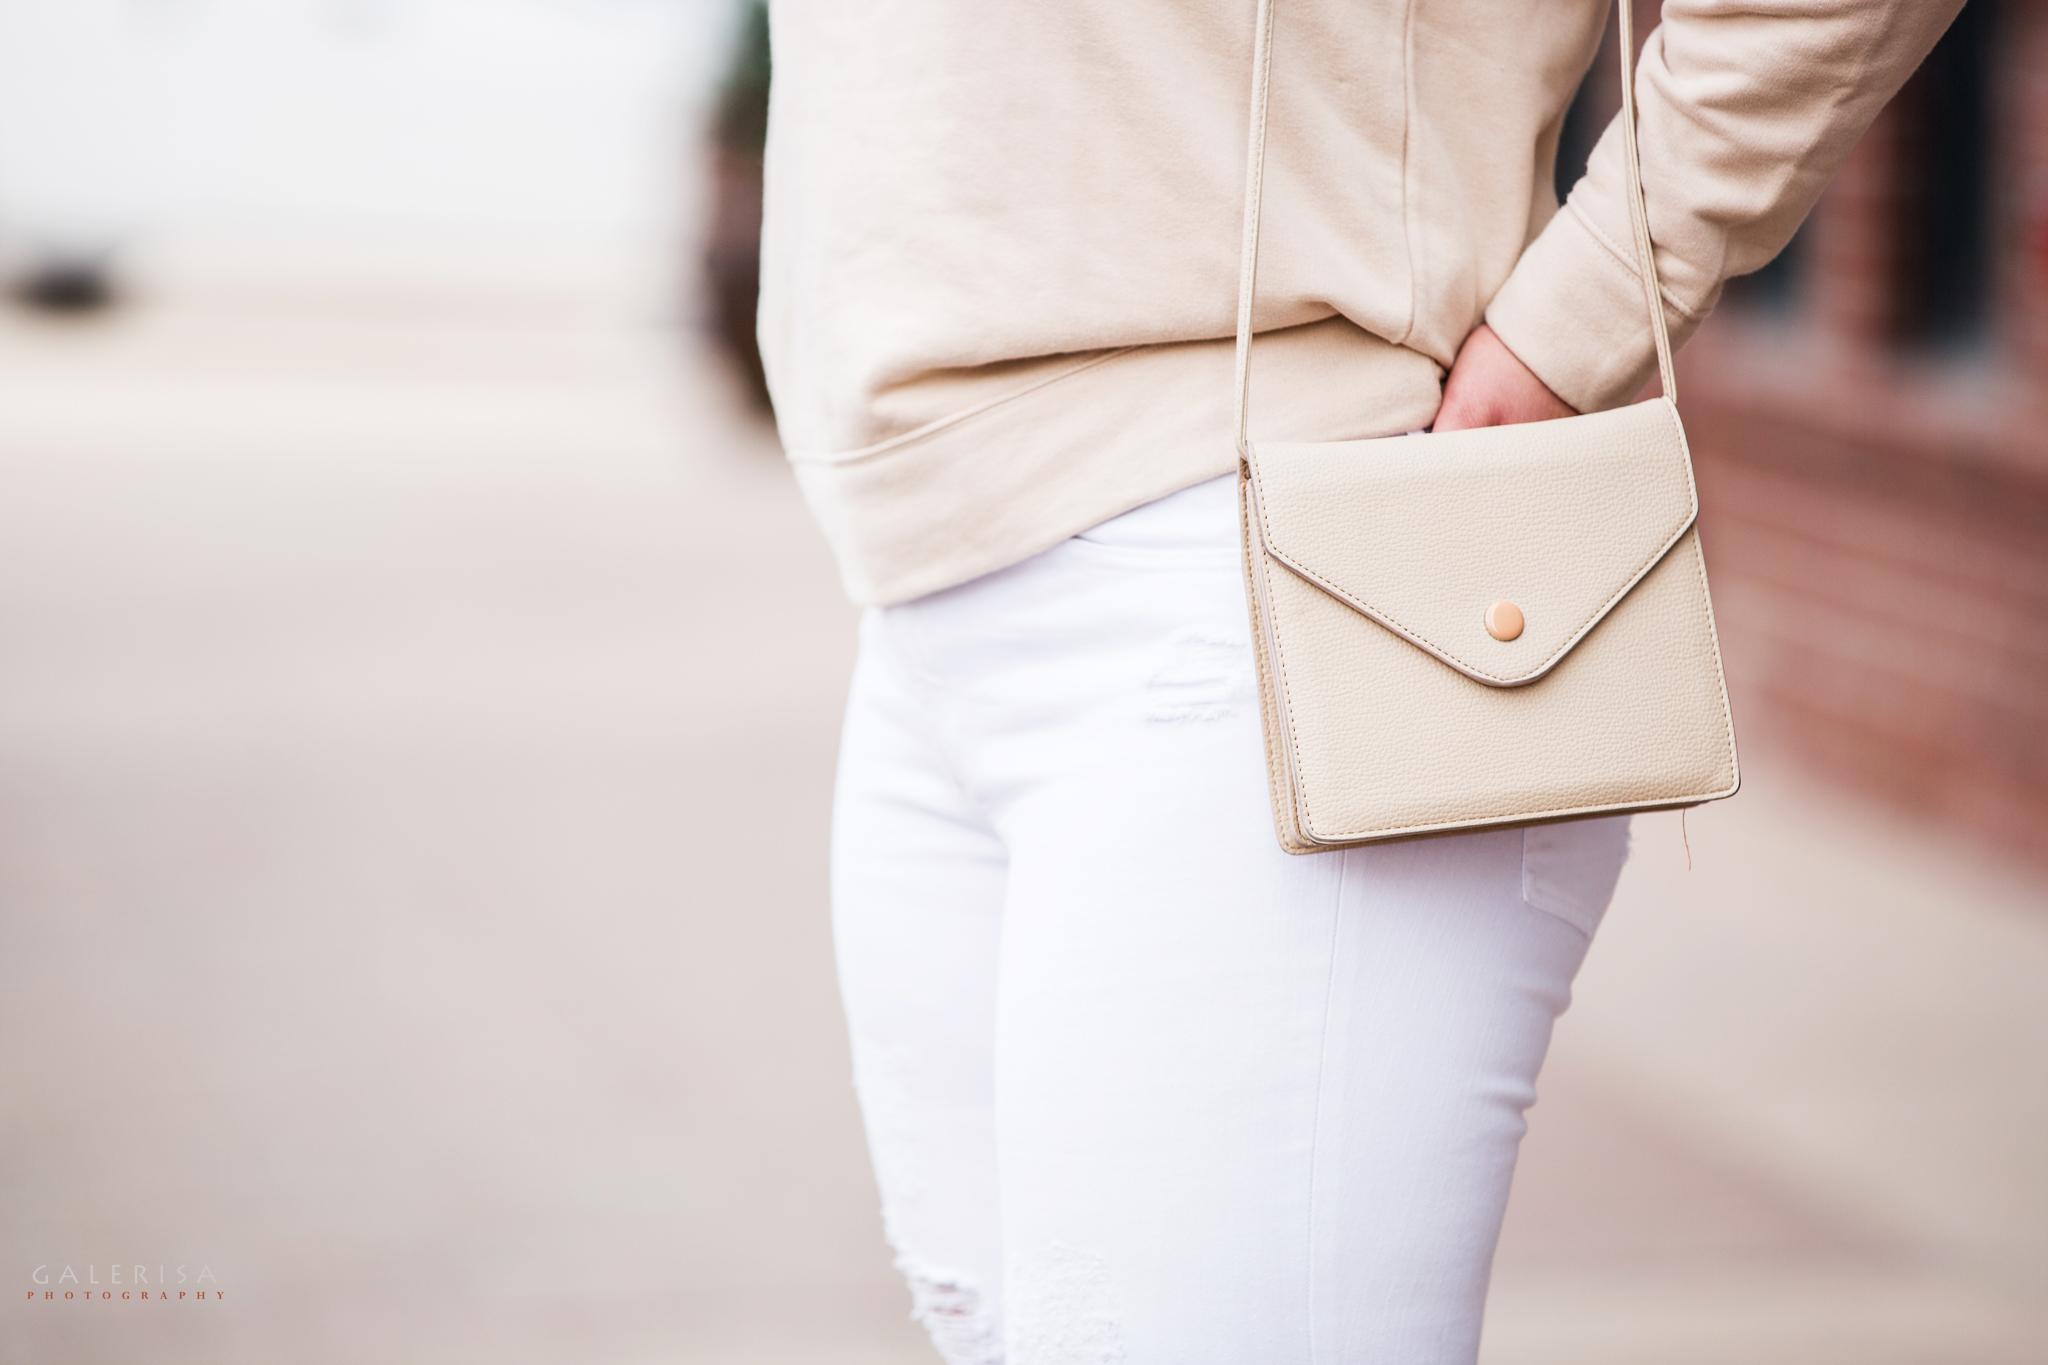 Raeann-Langas-Denver-Fashion-Blogger-white-pants-beige-sweater-GaleRisa-Photography-2016-36.jpg